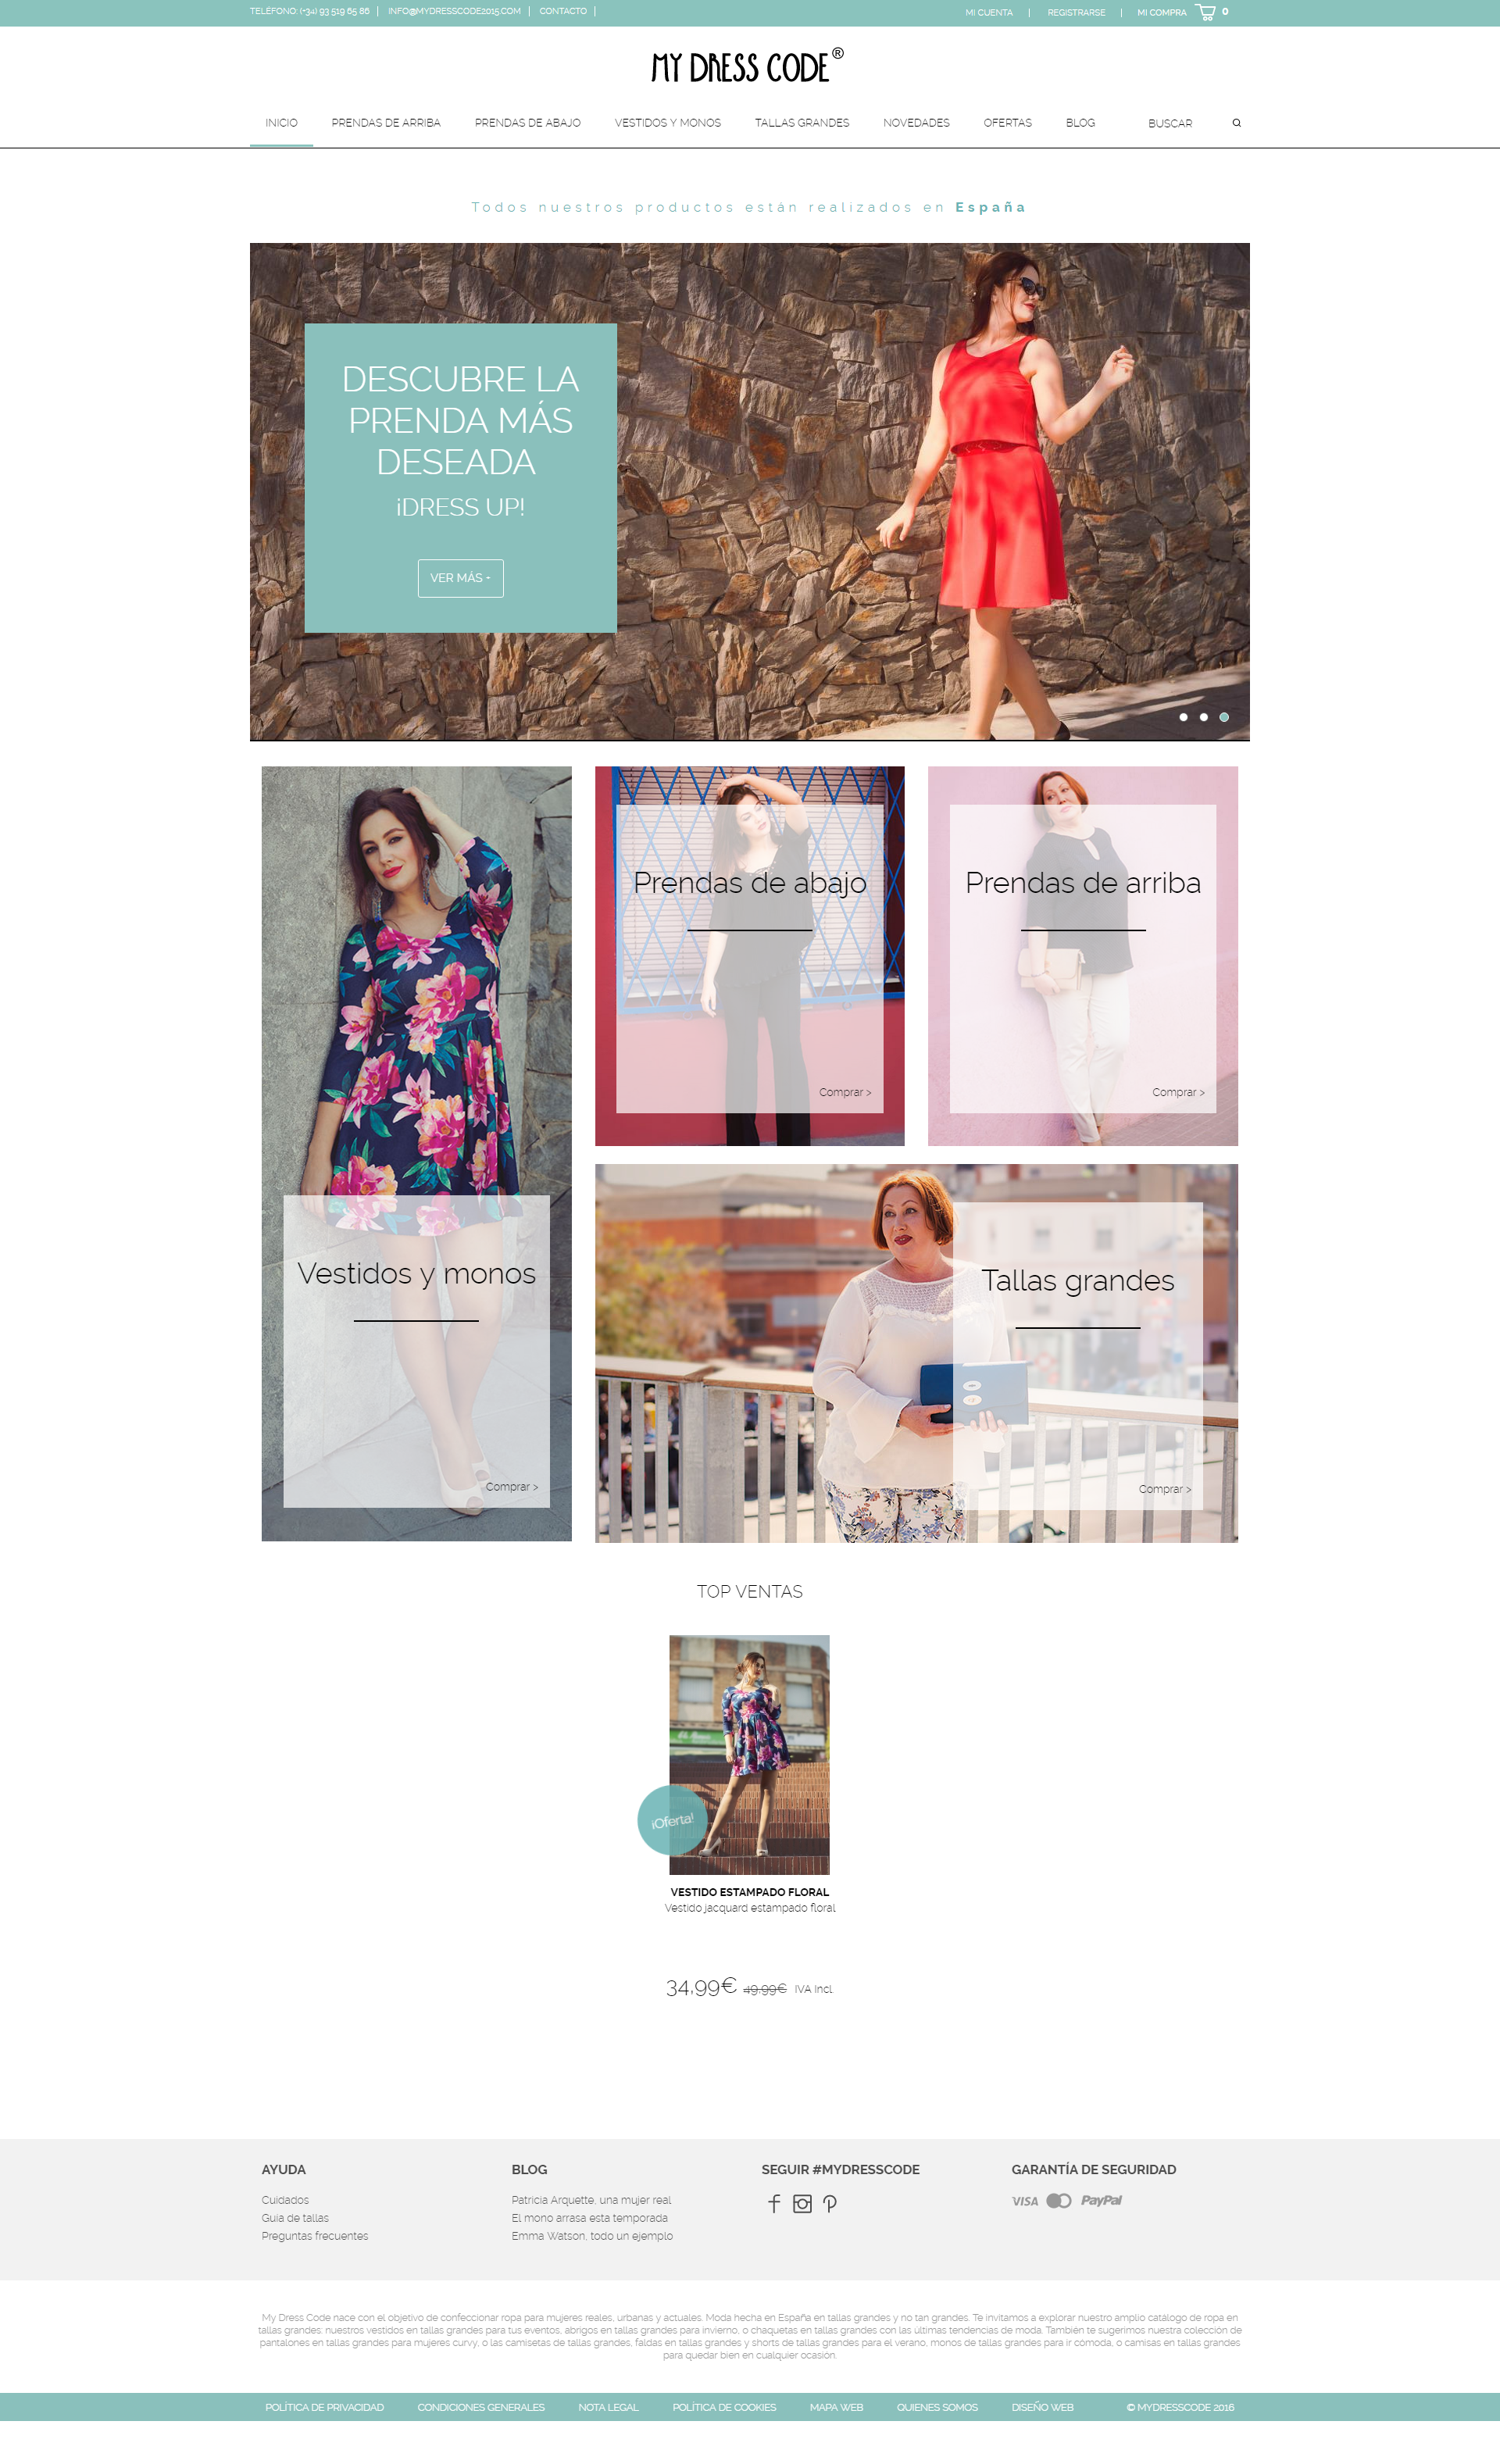 34730e53a9 Diseño web y plan de marketing online para My Dress Code ...